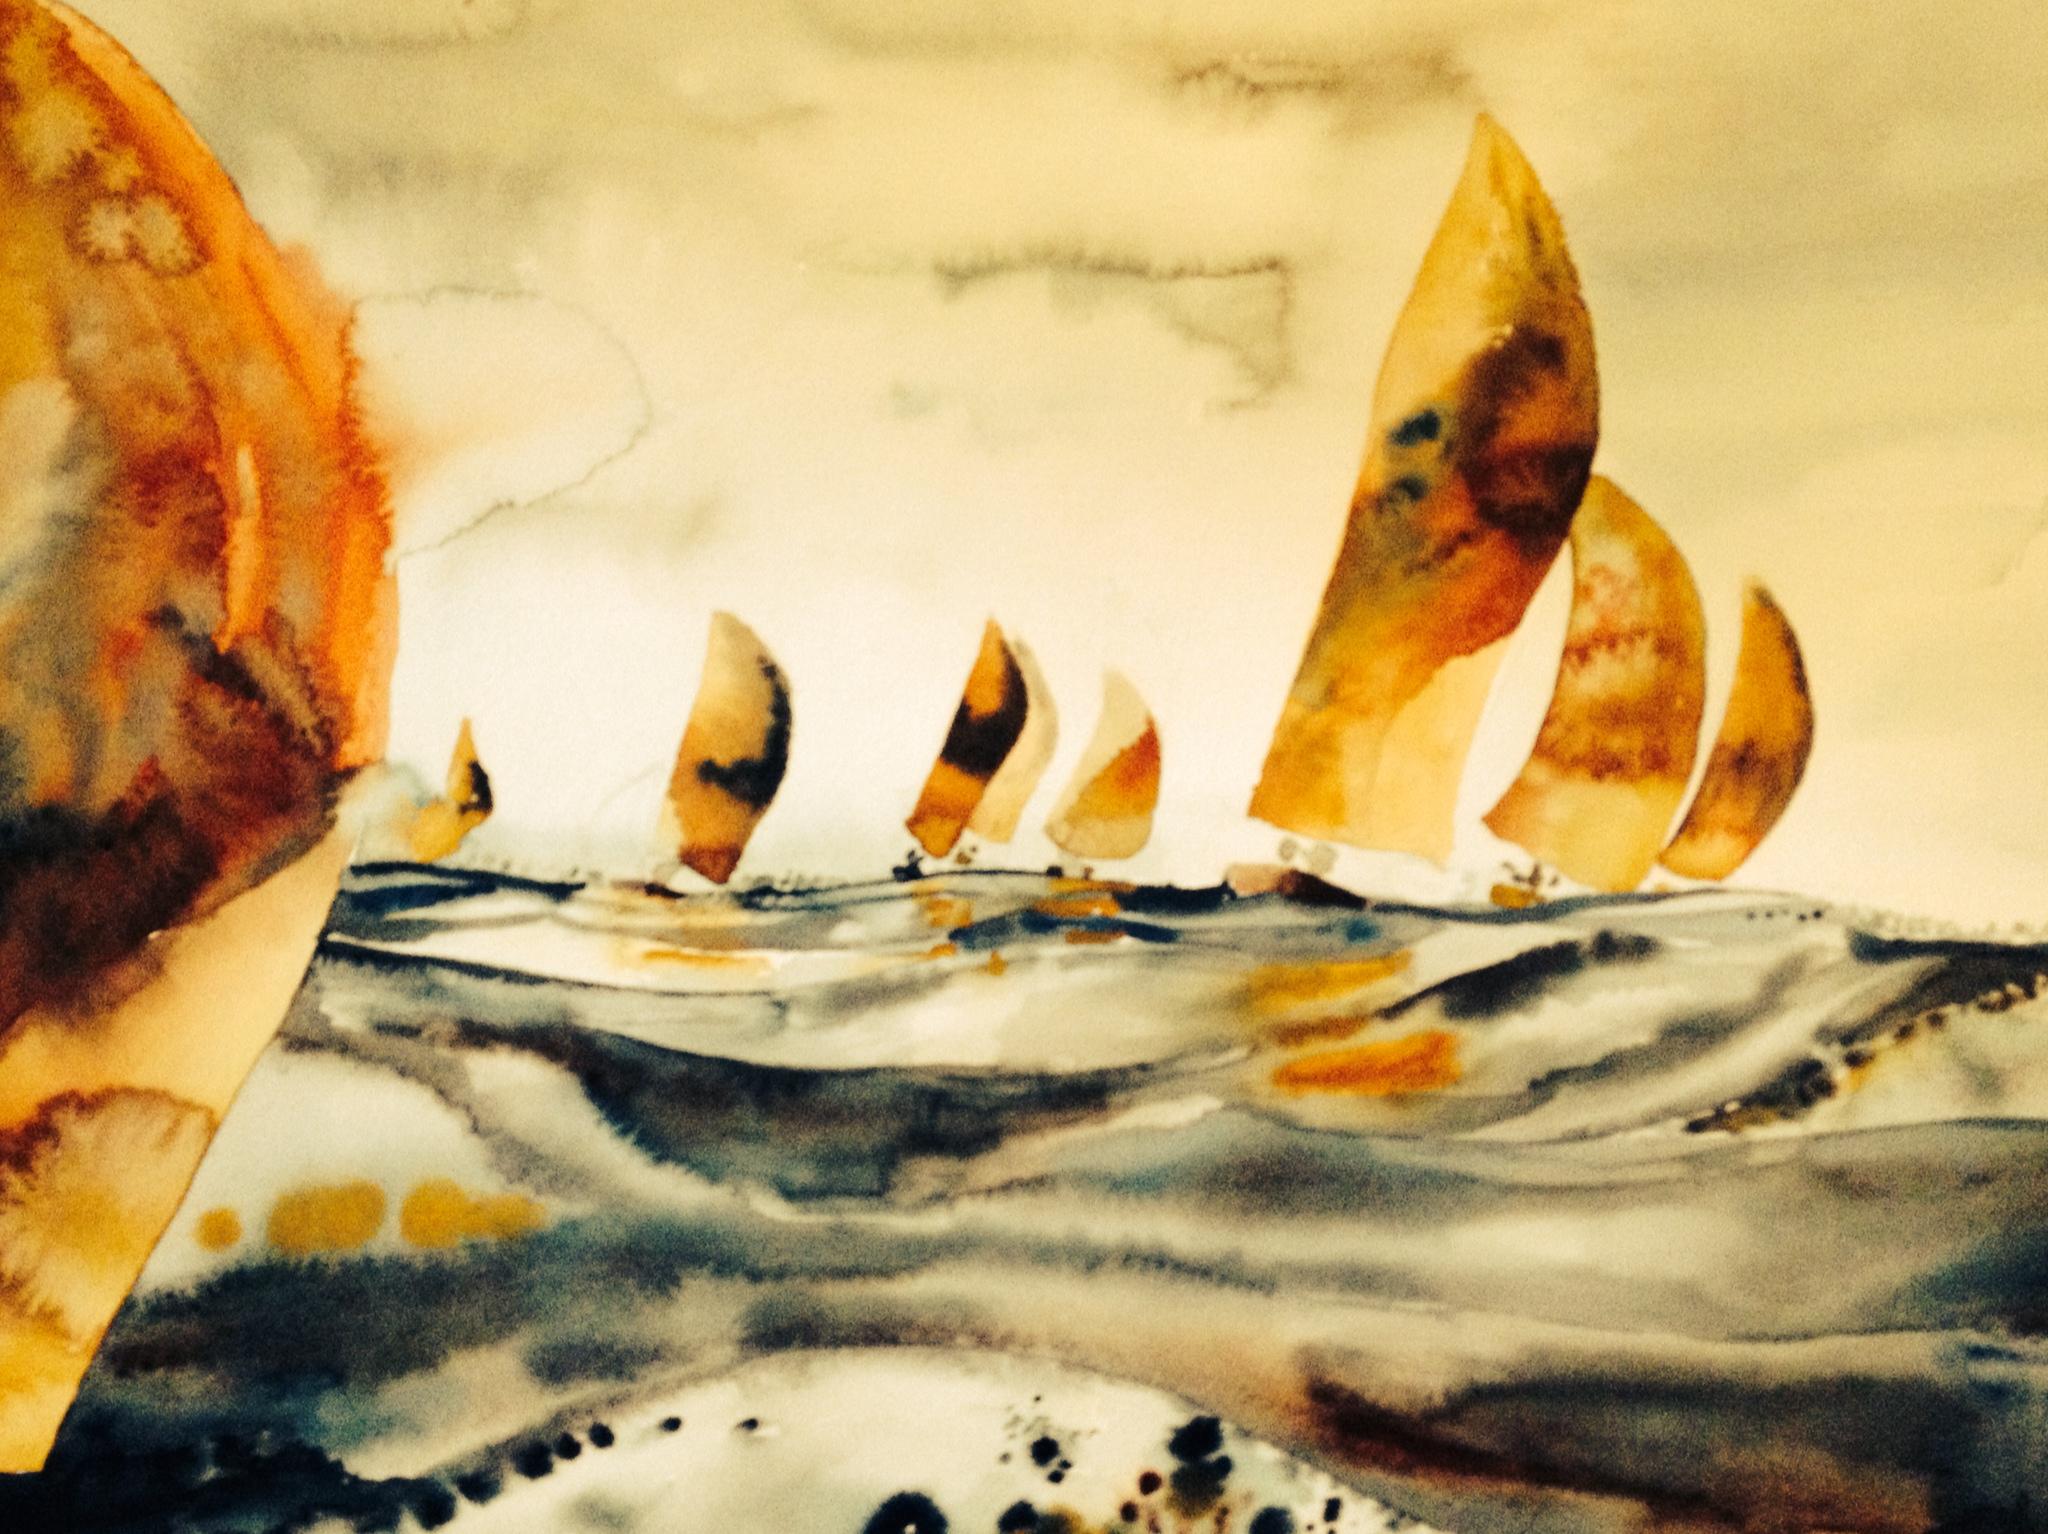 Fiona MacDonald, artist